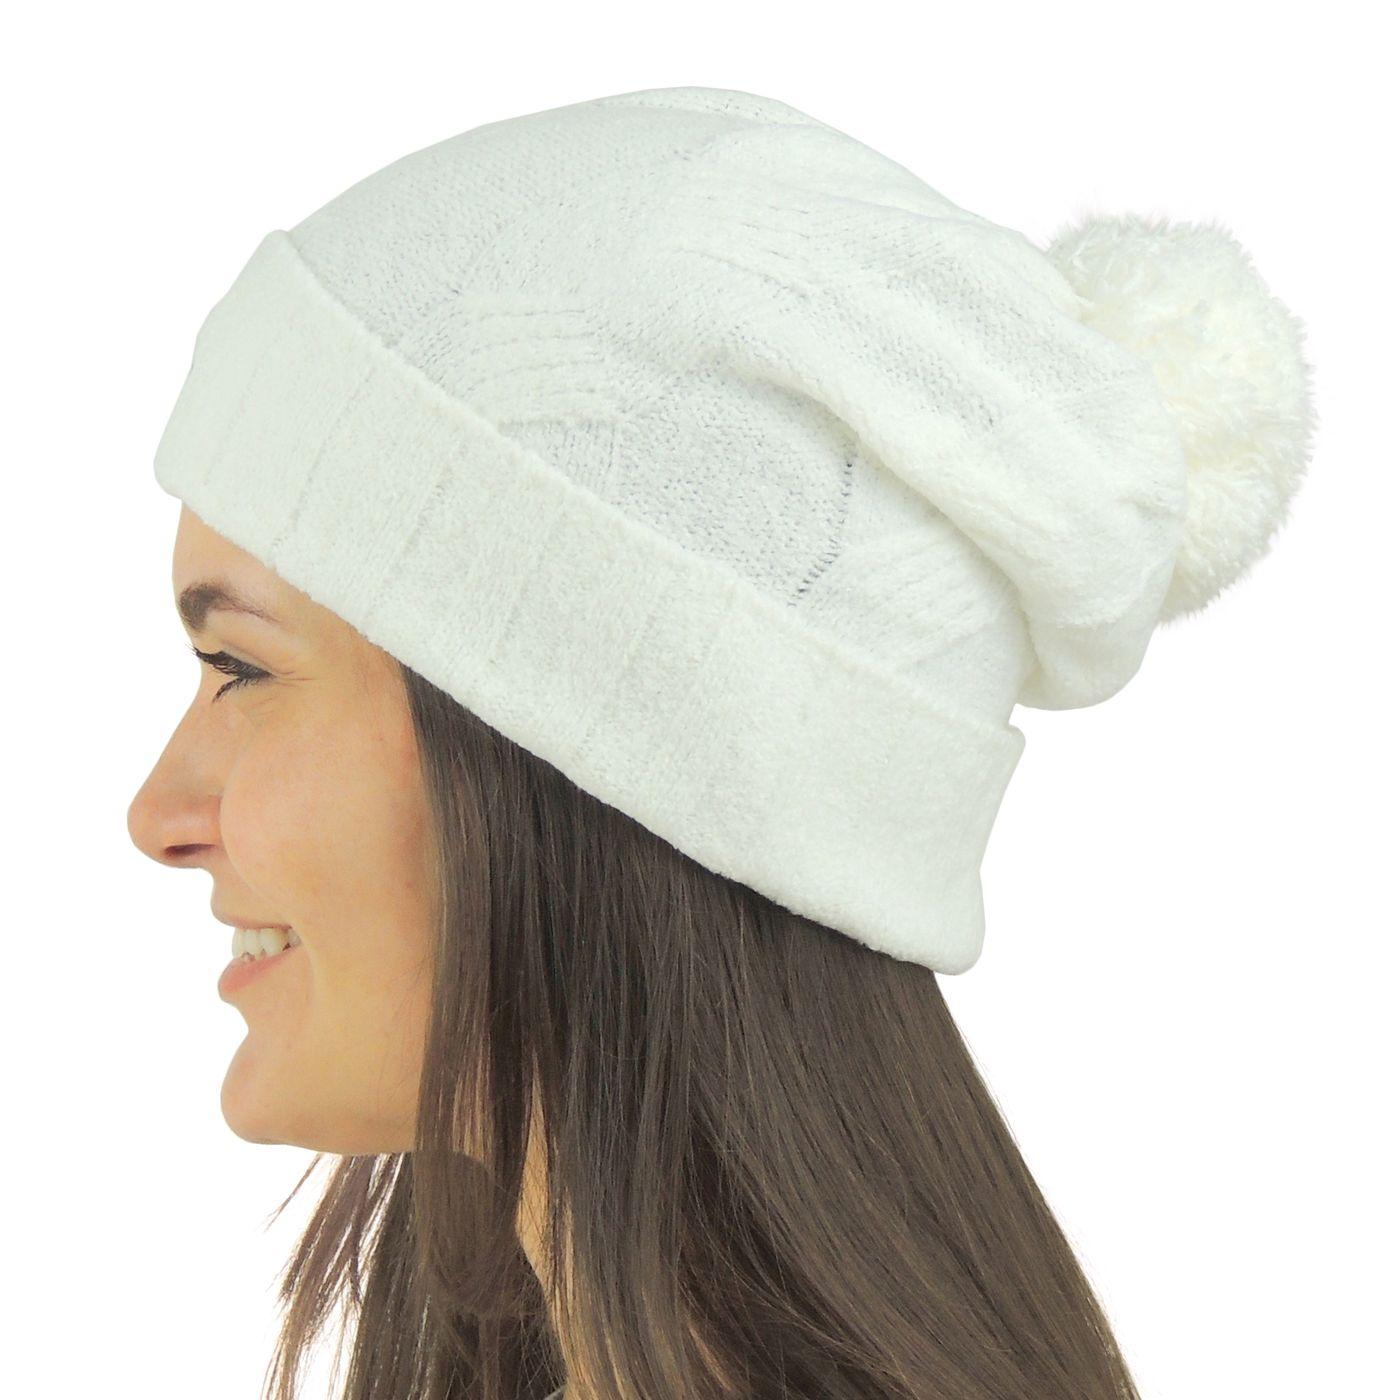 db86b5bc815f8 Gorro Feminino Pompom Off White Chelsea para o inverno - fieroshop